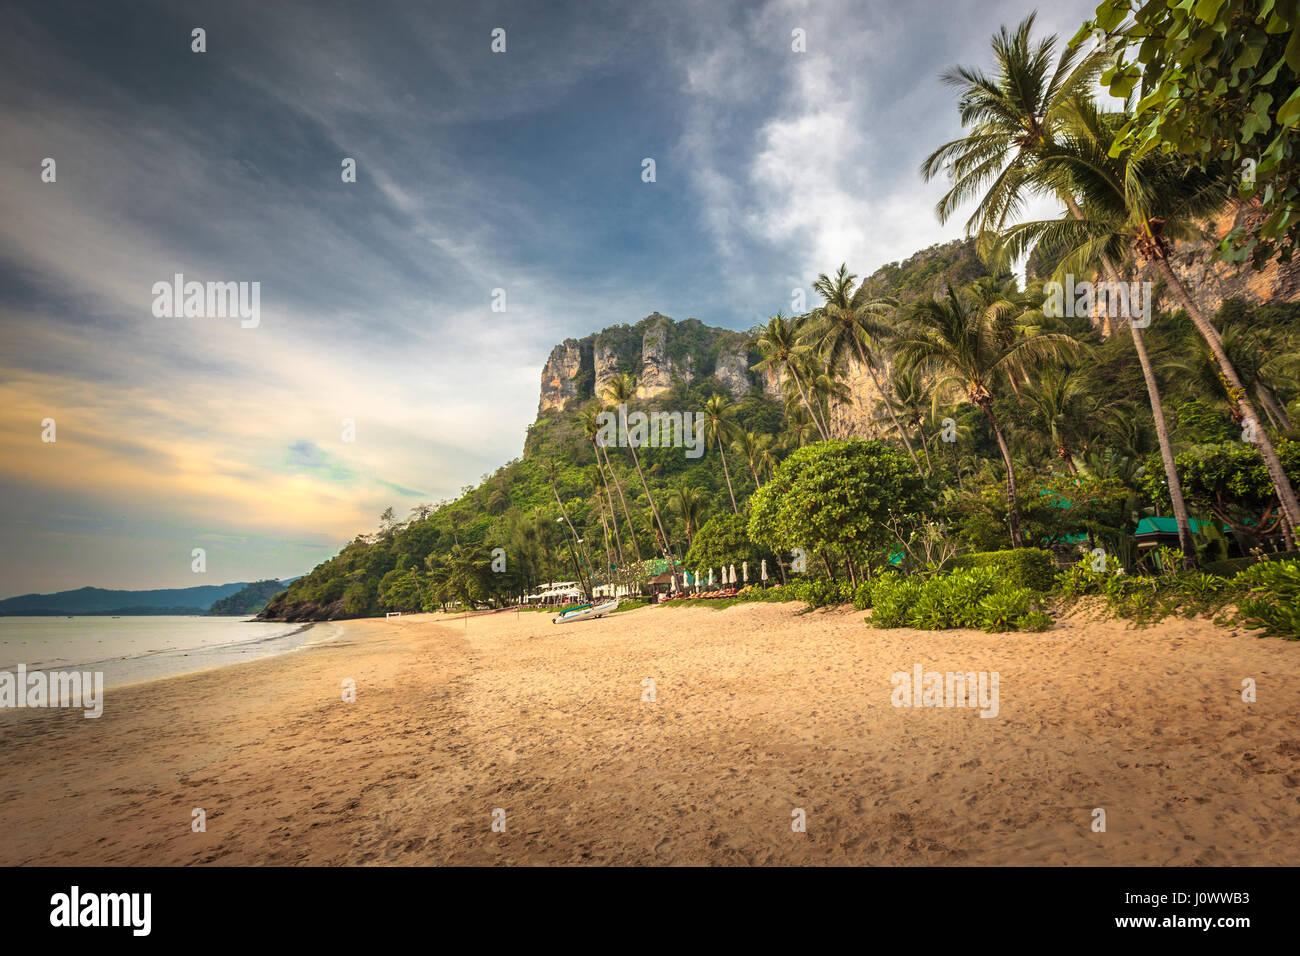 Pai Plong Beach, Ao Nang, Krabi Province, Thailand, Southeast Asia - Stock Image